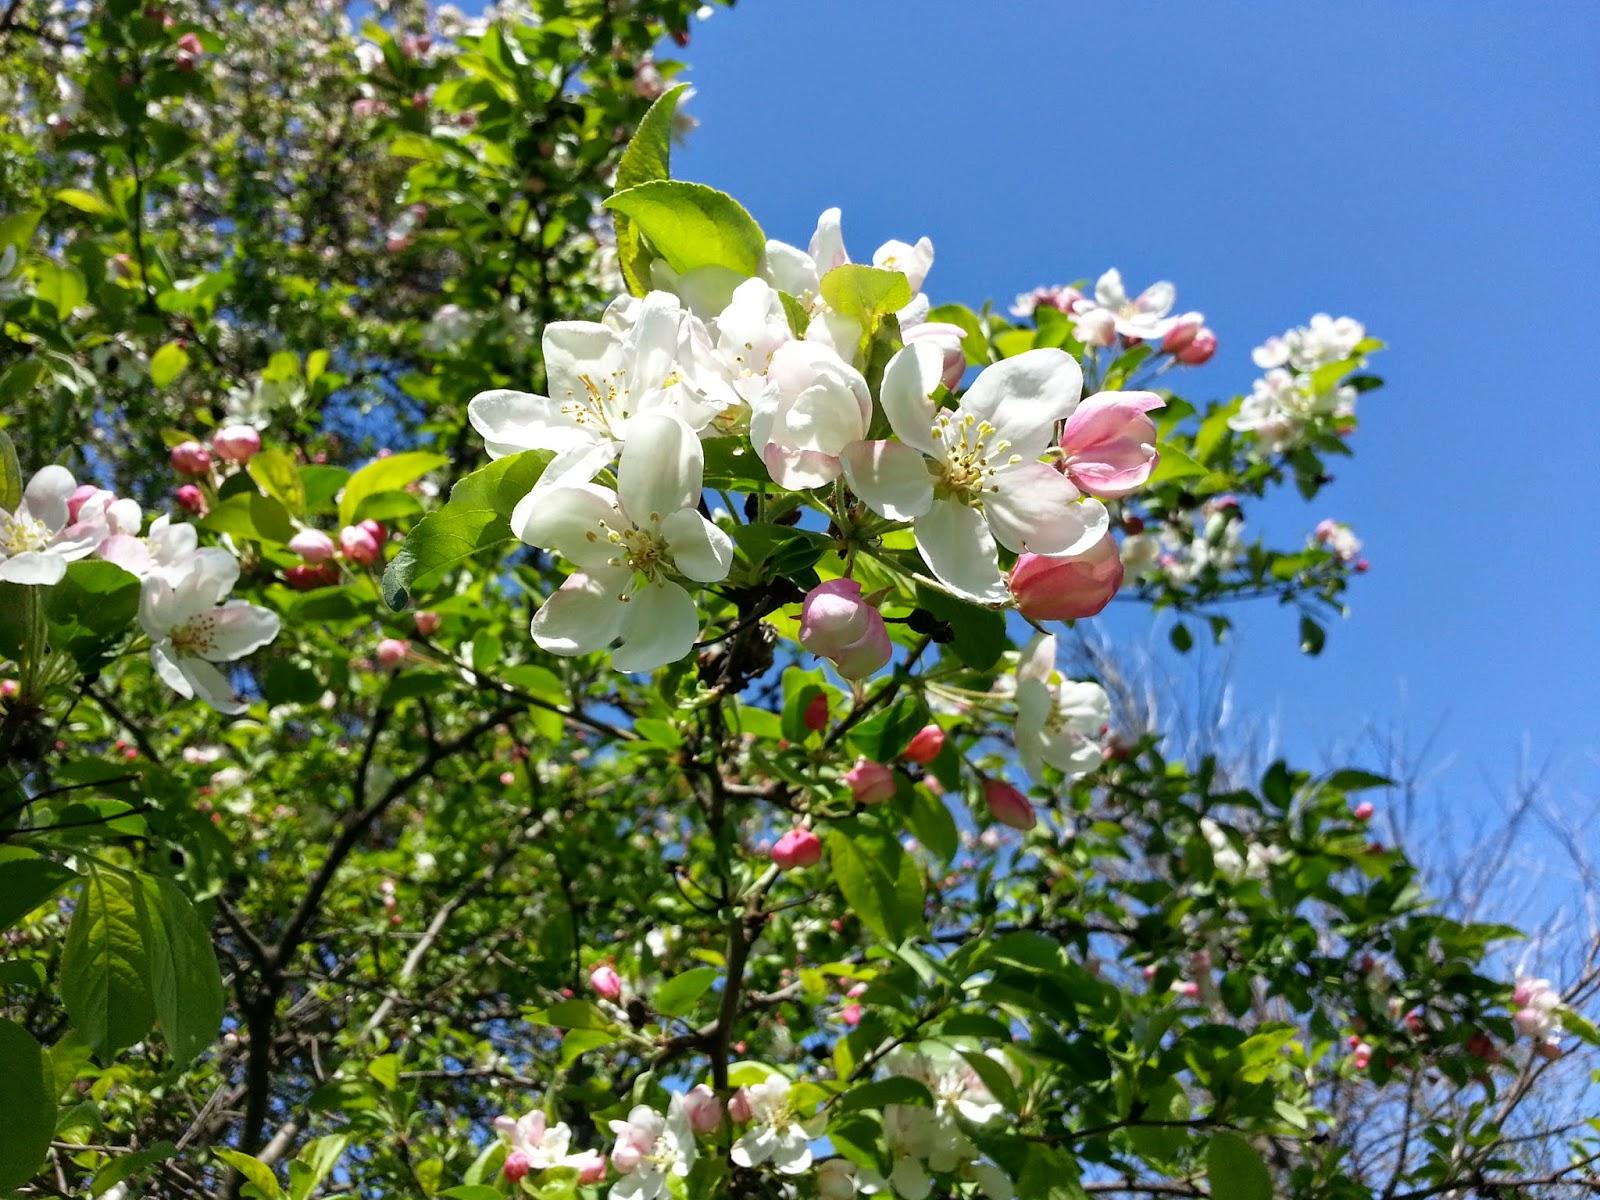 Naapurin omenapuu